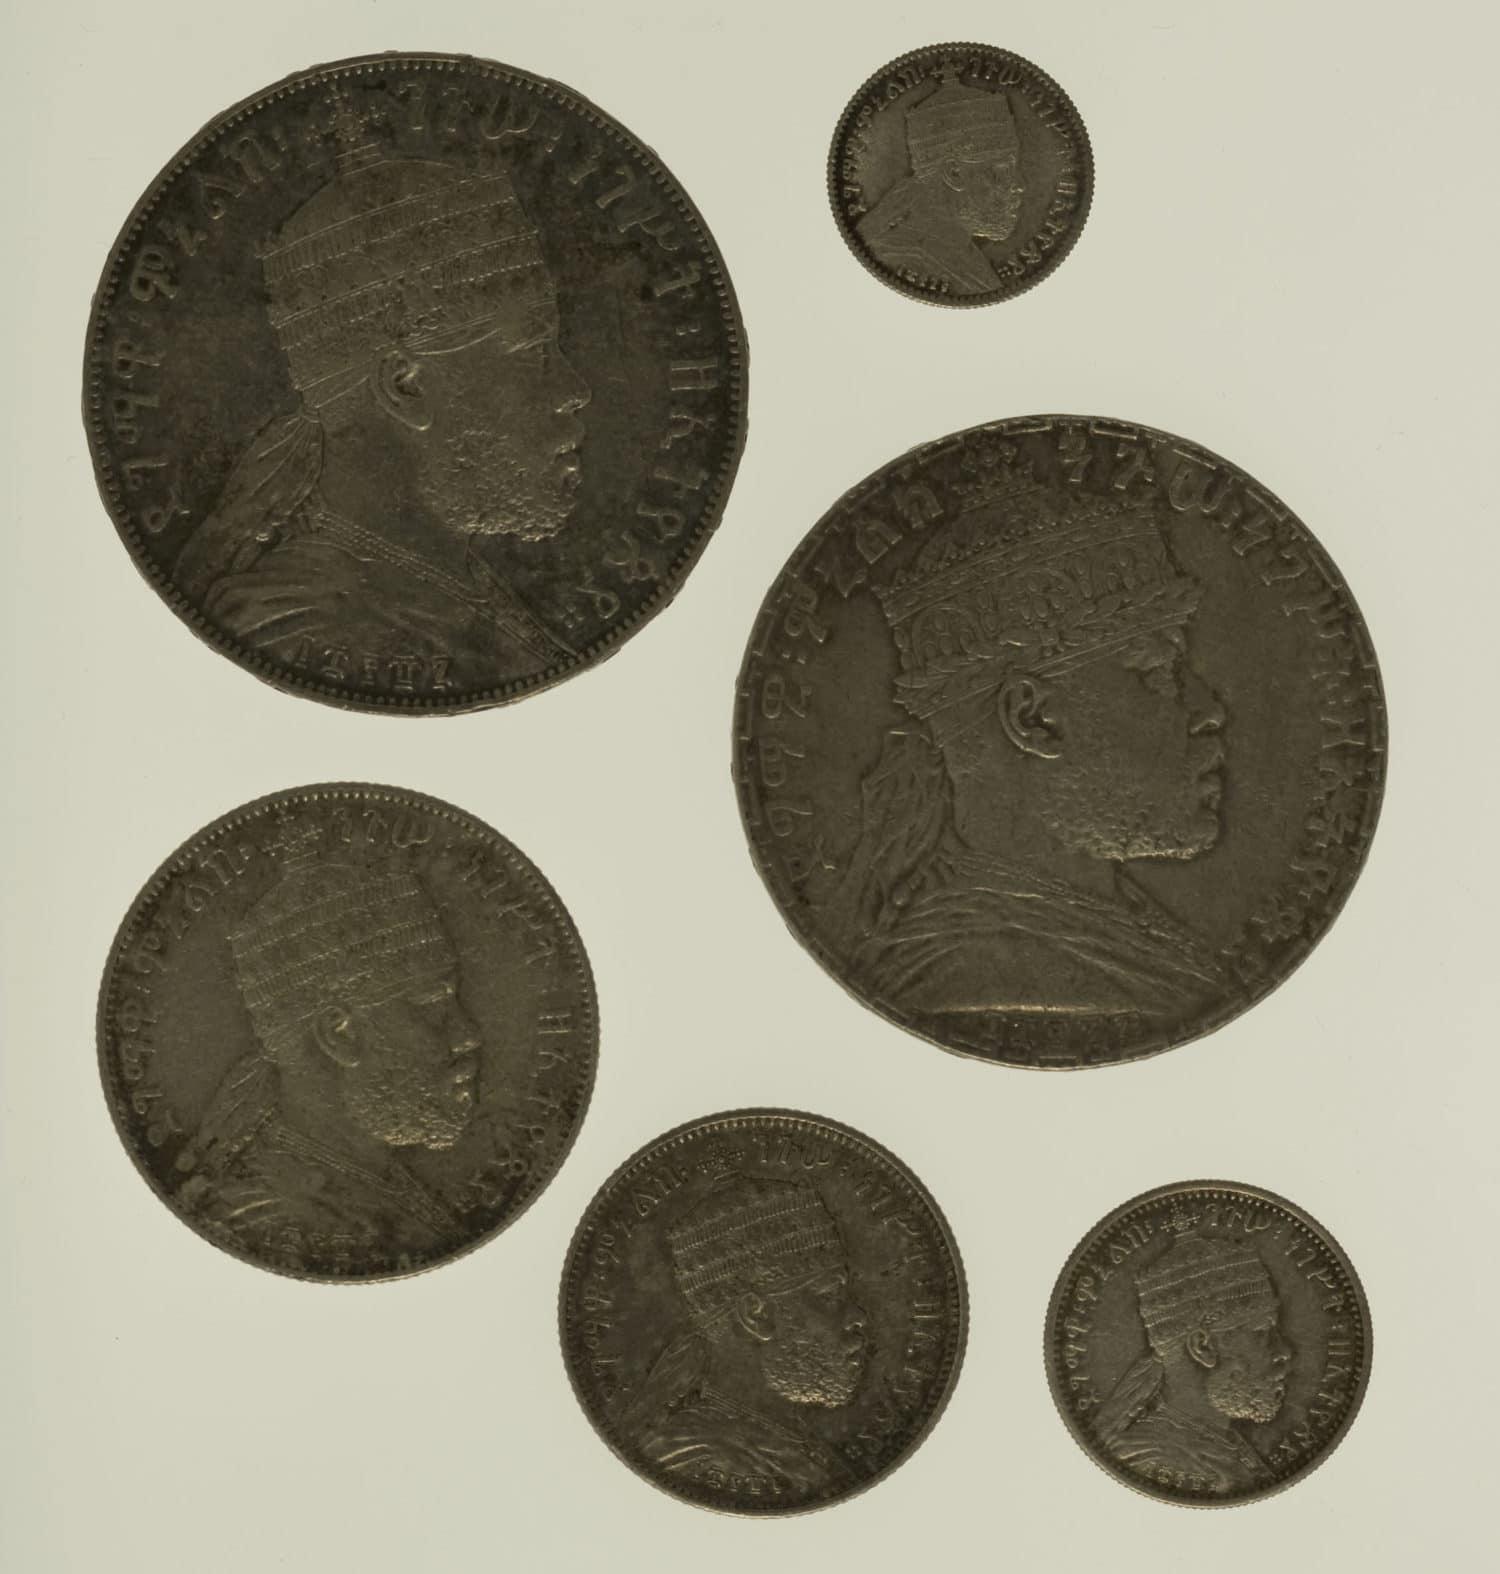 aethiopien-silbermuenzen-uebrige-welt - Äthiopien Menelik II. Lot